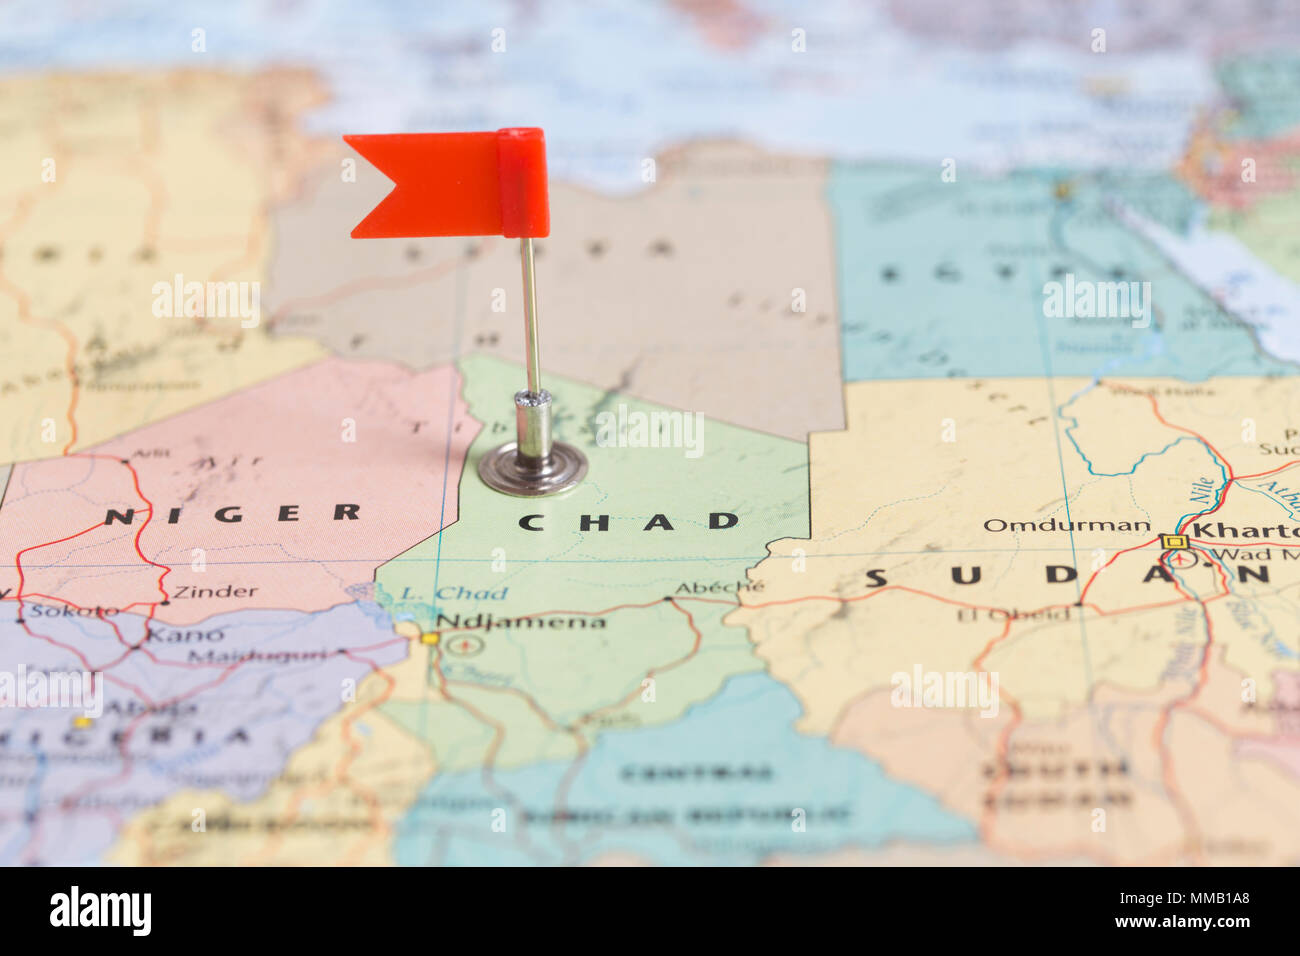 Map Of Chad Stockfotos & Map Of Chad Bilder - Alamy